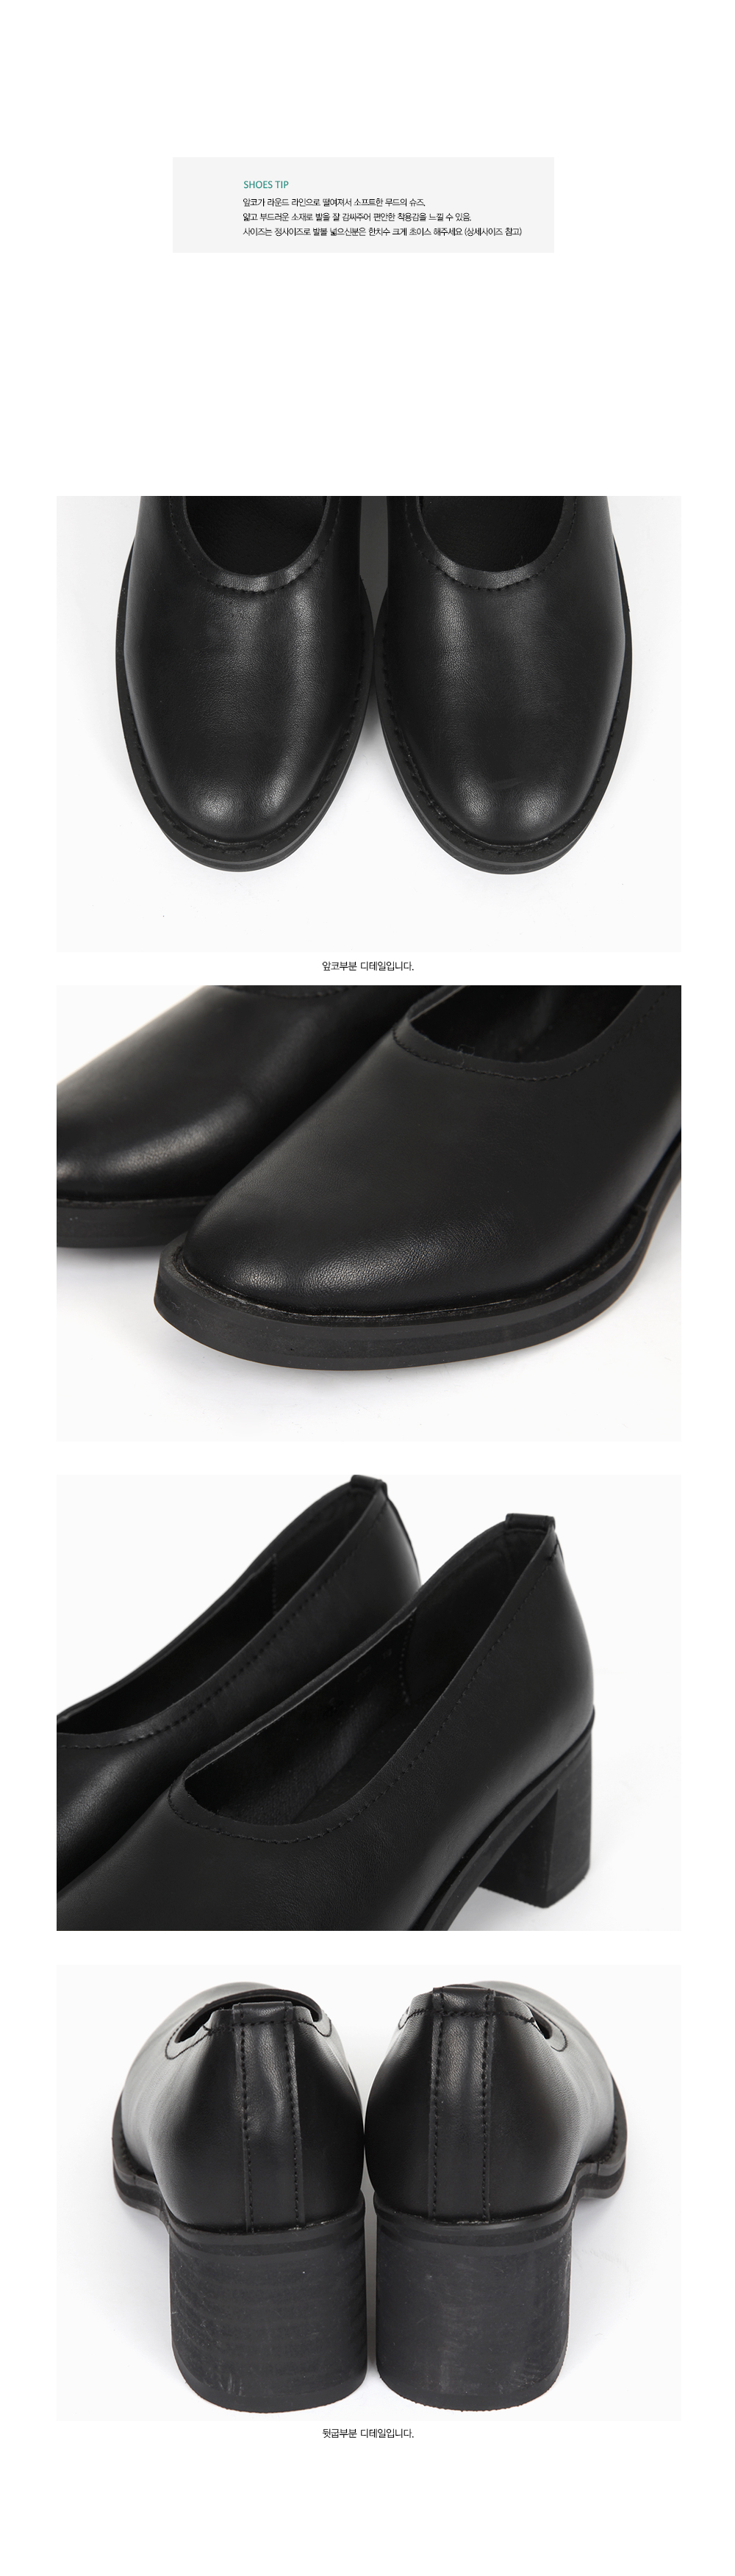 girlish round heel (2 colors)